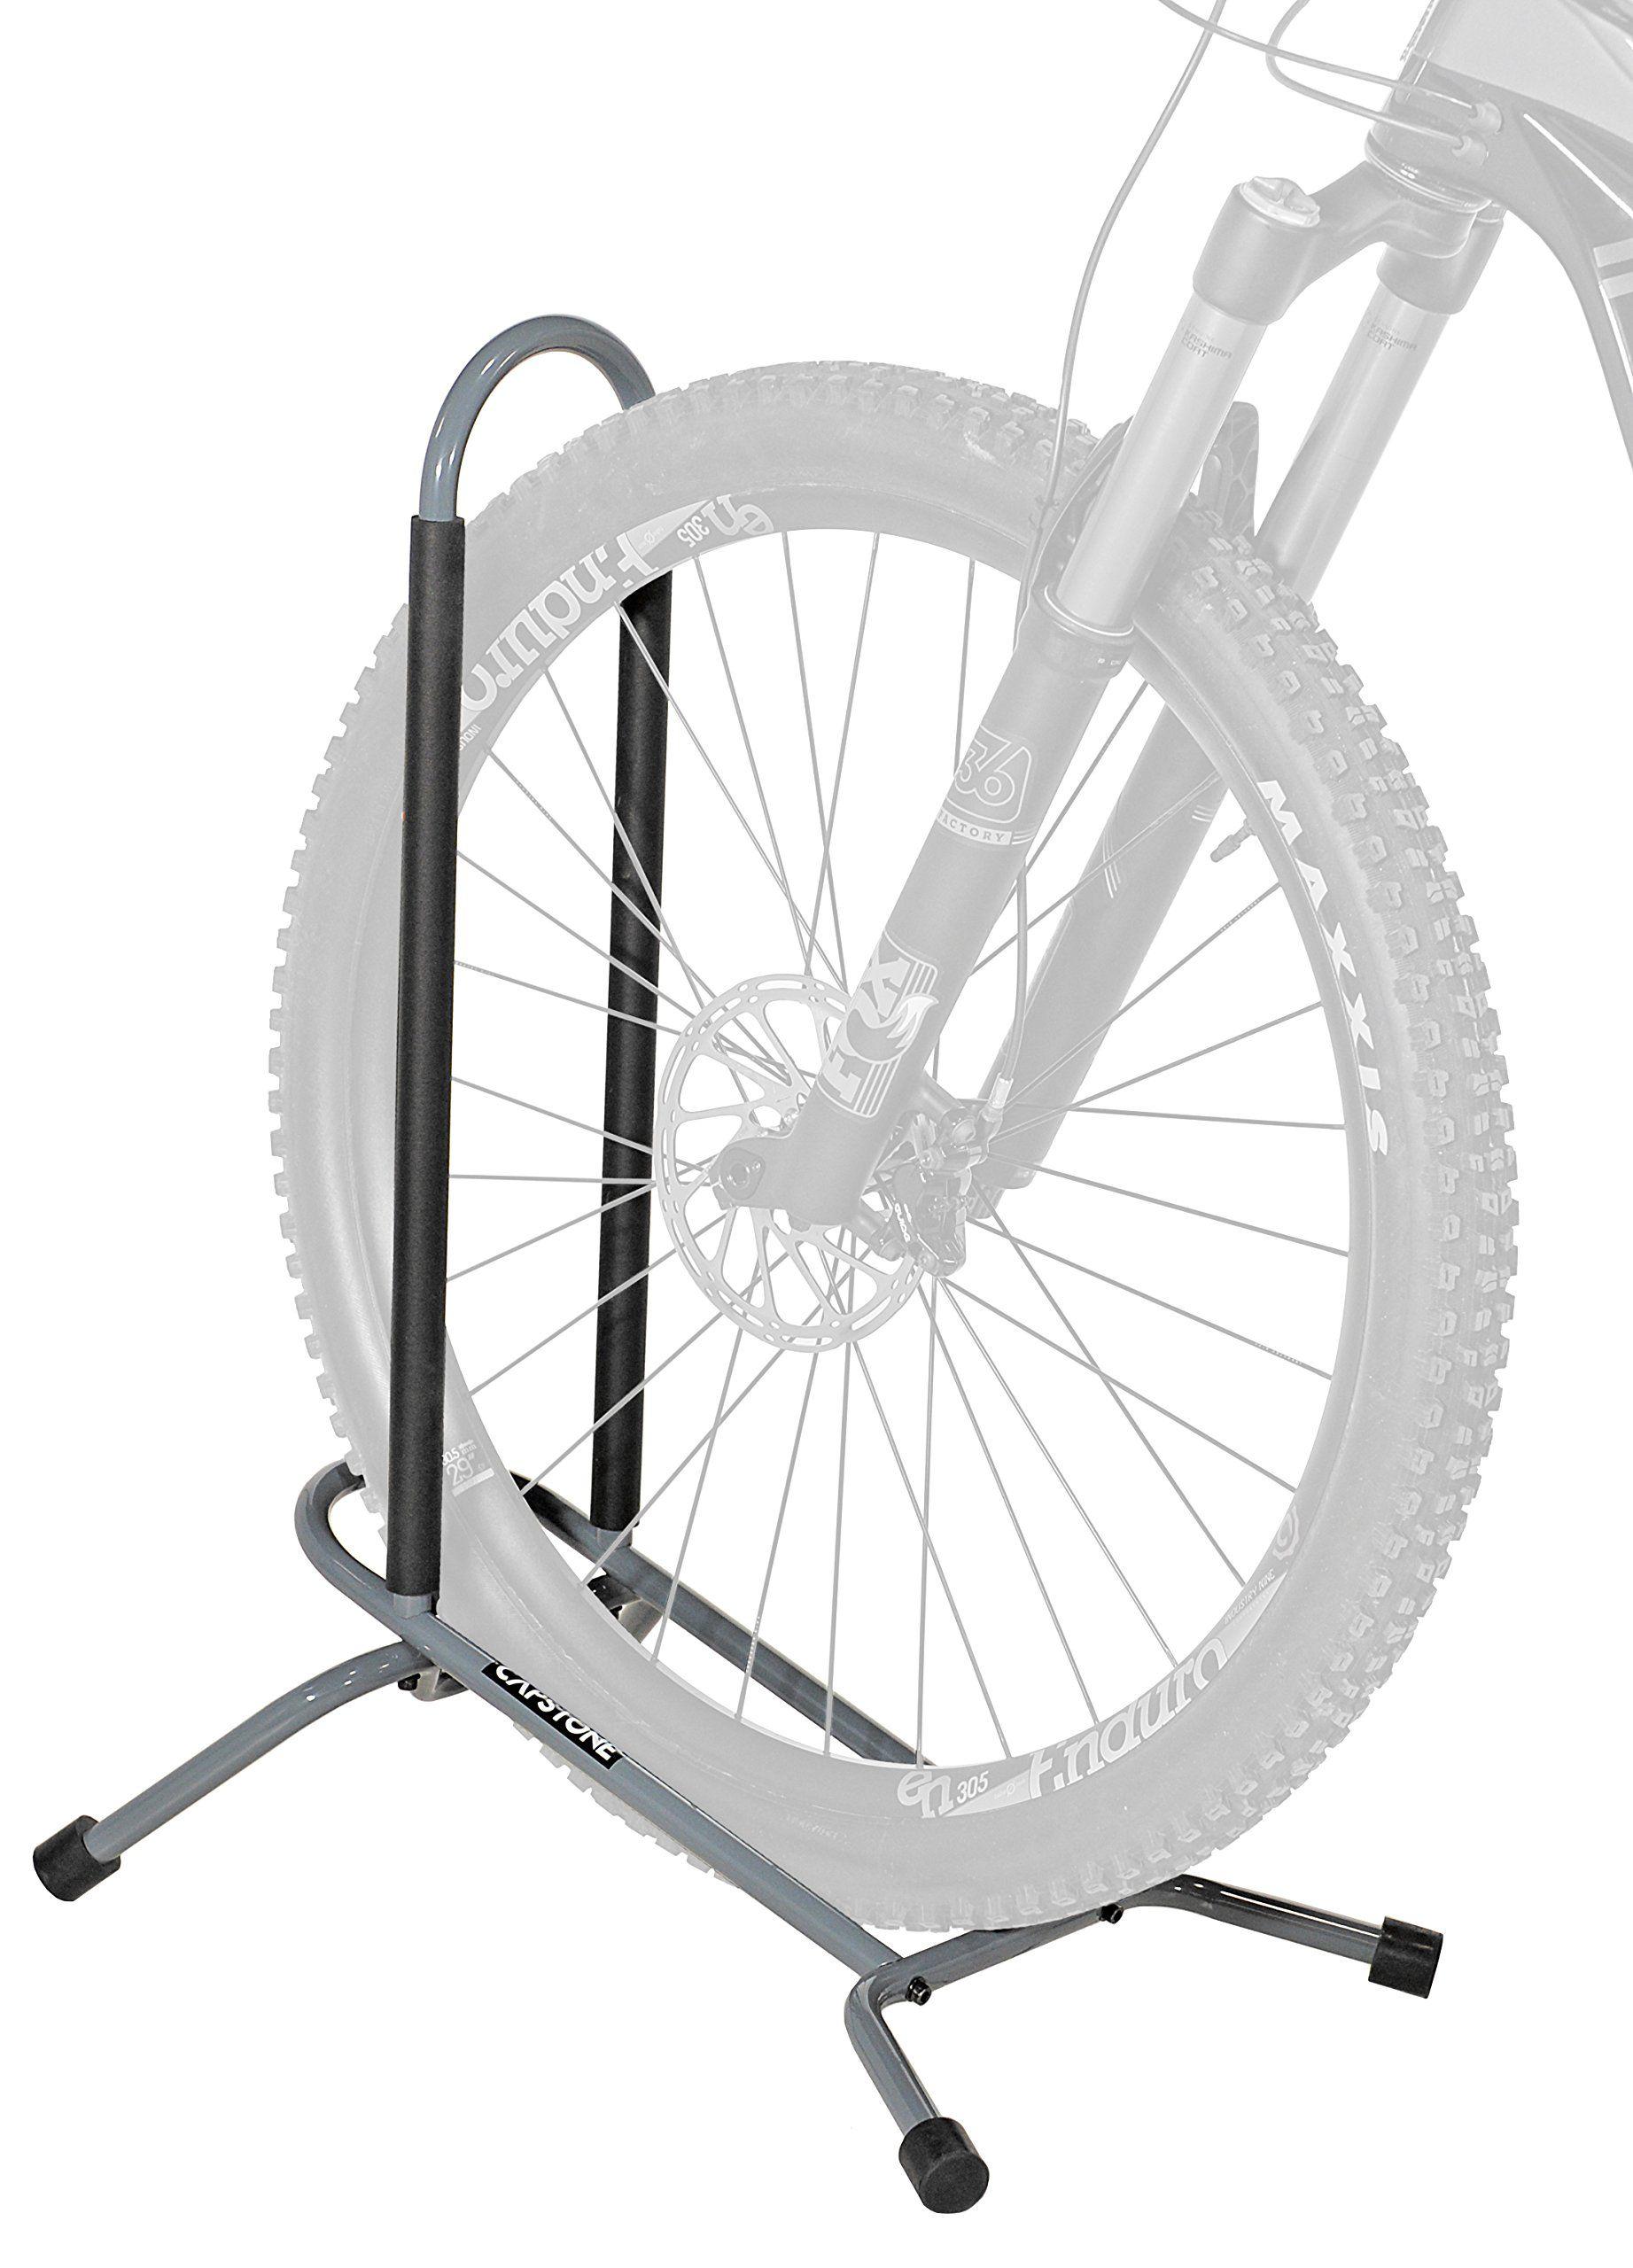 Pin On Indoor Bike Storage